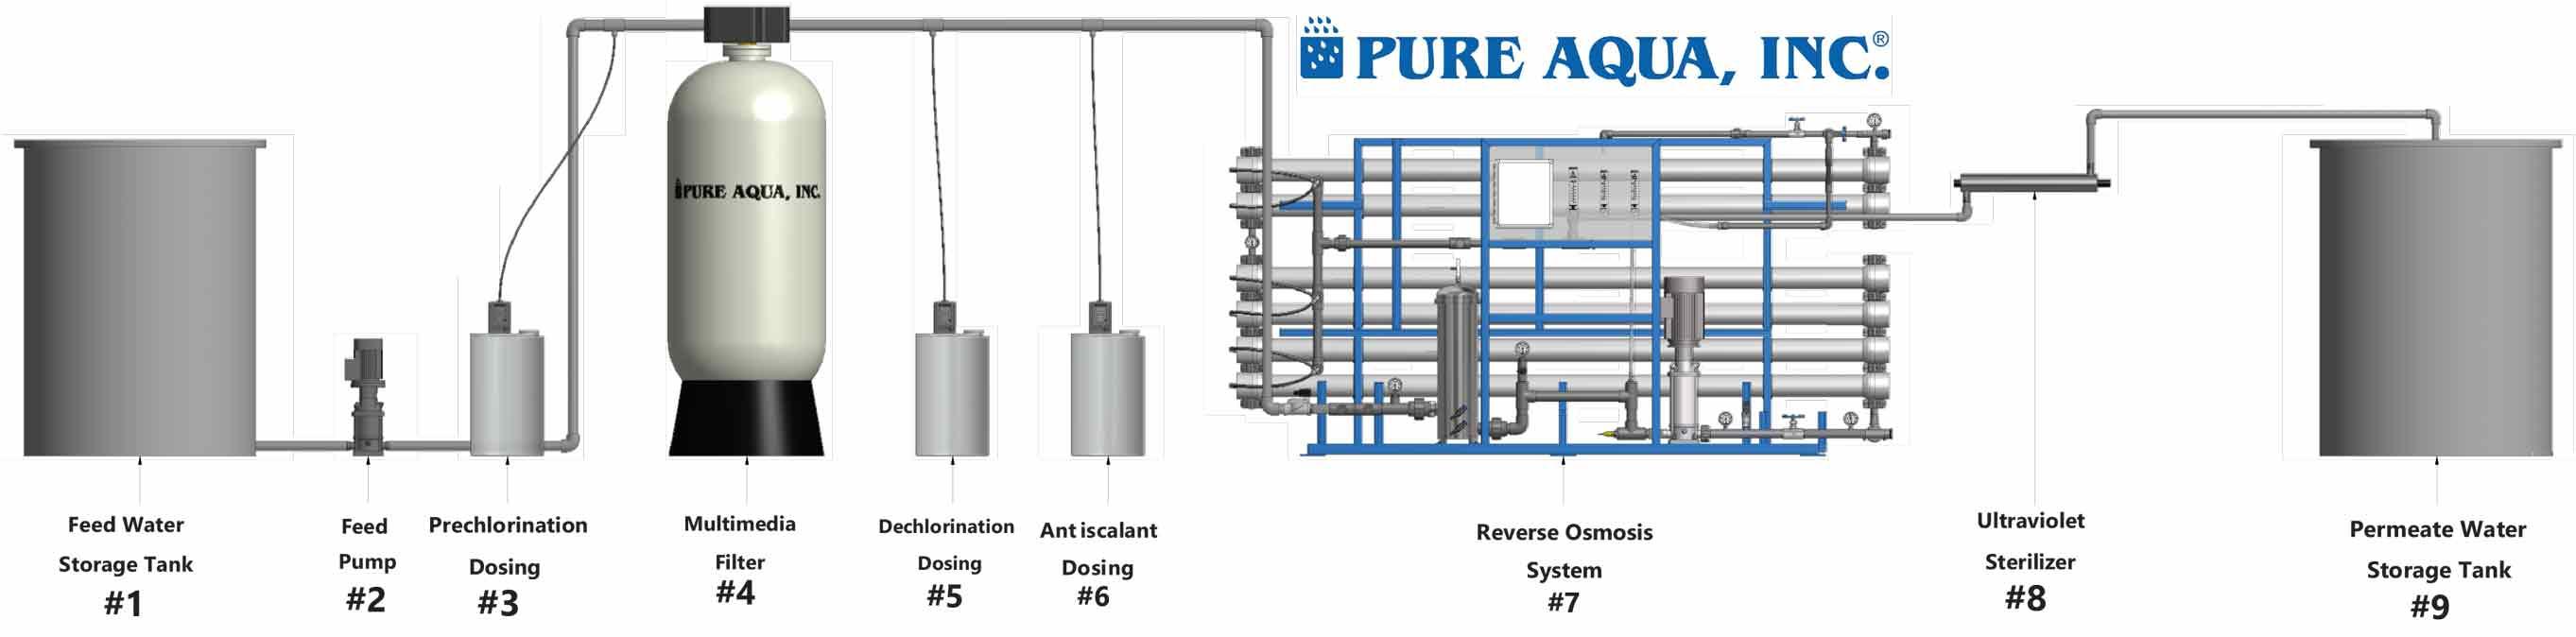 tratamento-de-agua-sistemas-alimentos-e-bebidas.jpg